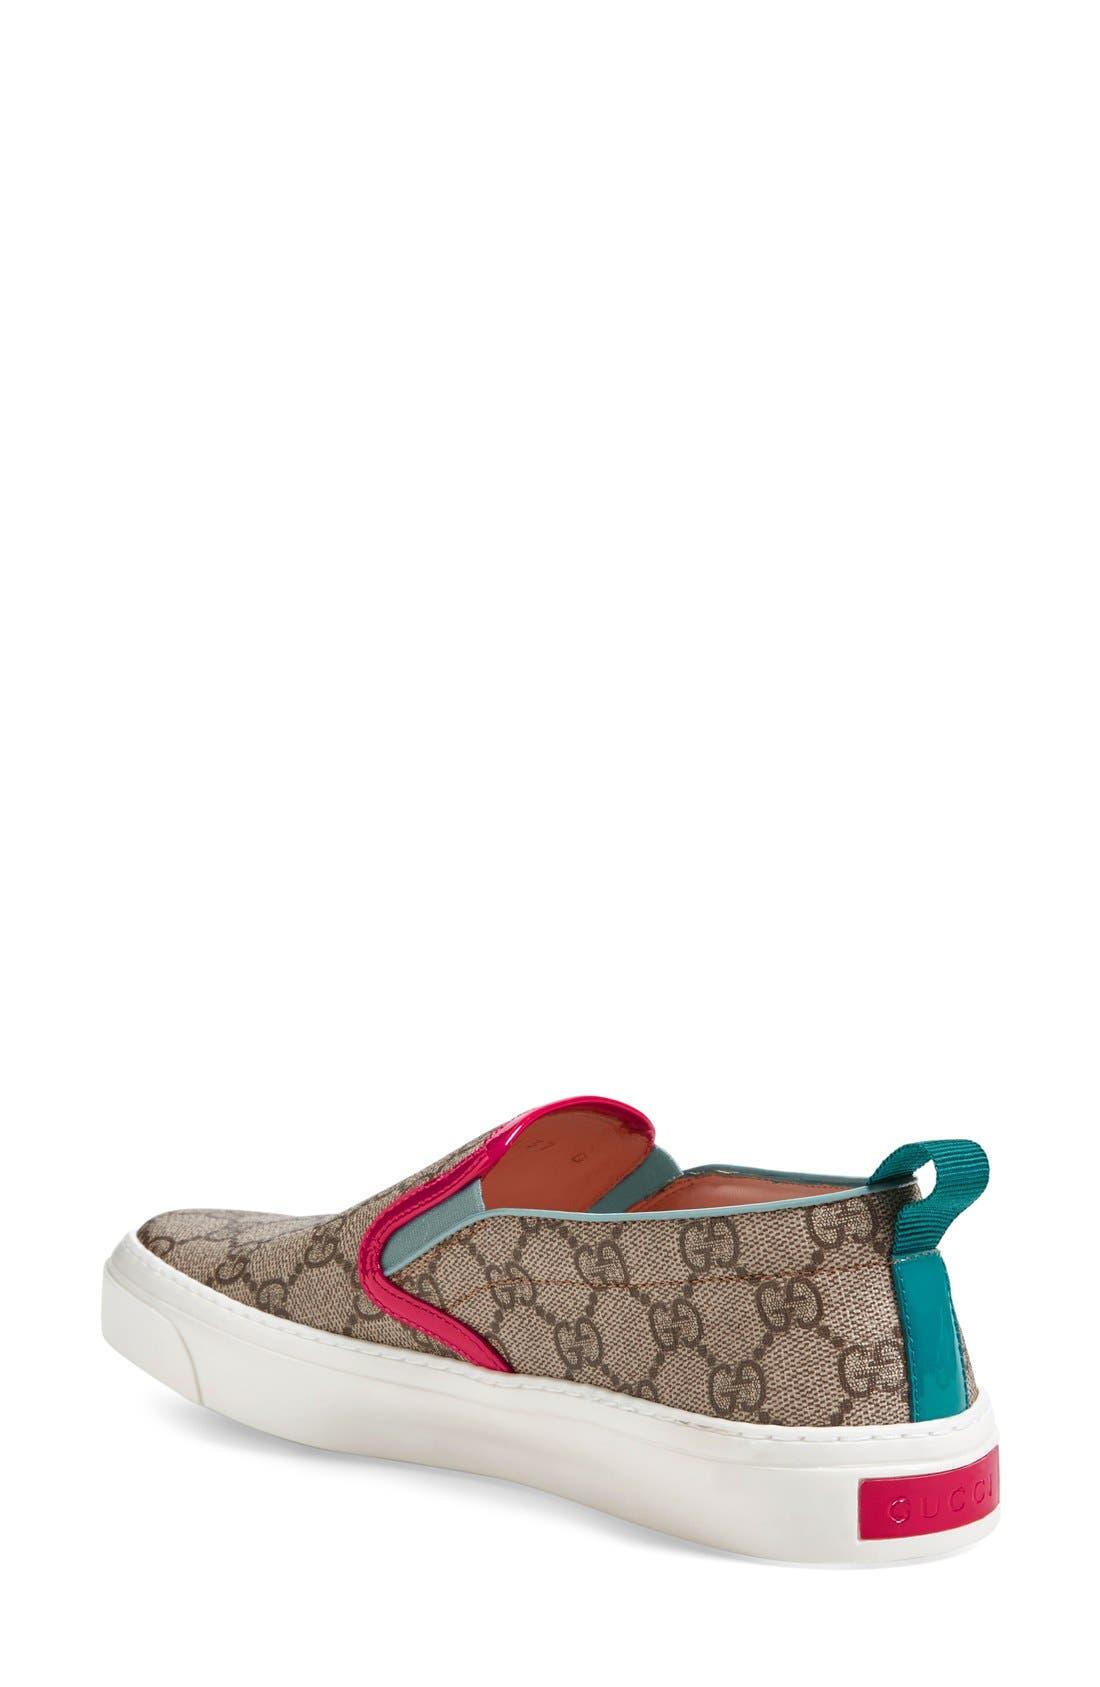 Alternate Image 2  - Gucci 'Board' Skate Slip-On (Women)